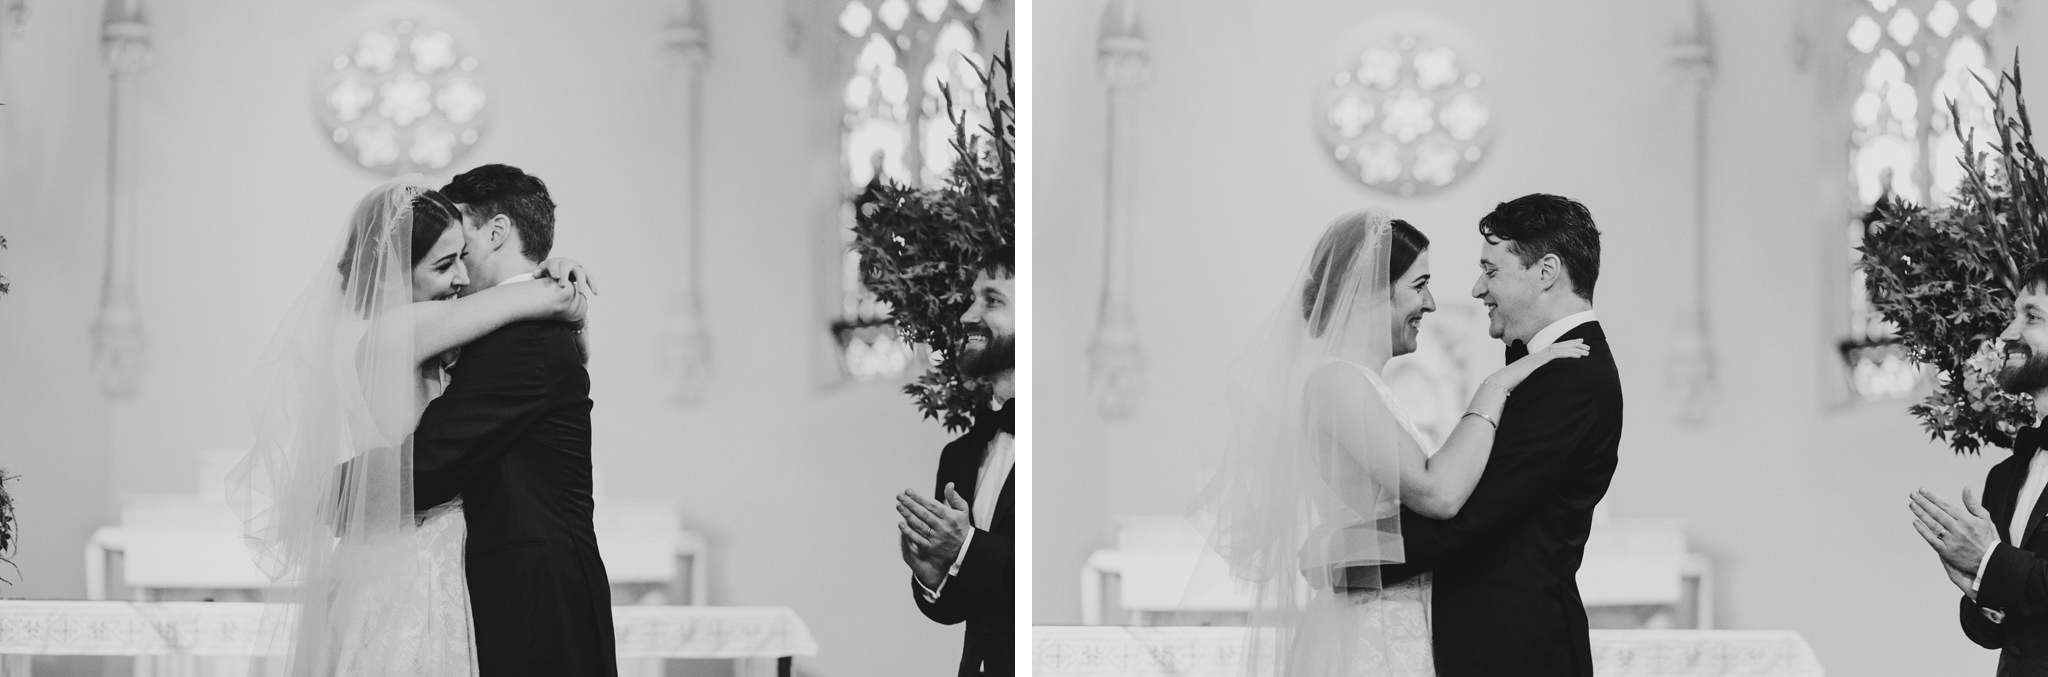 Abbotsford_Convent_Wedding_Peter_Anna066.JPG